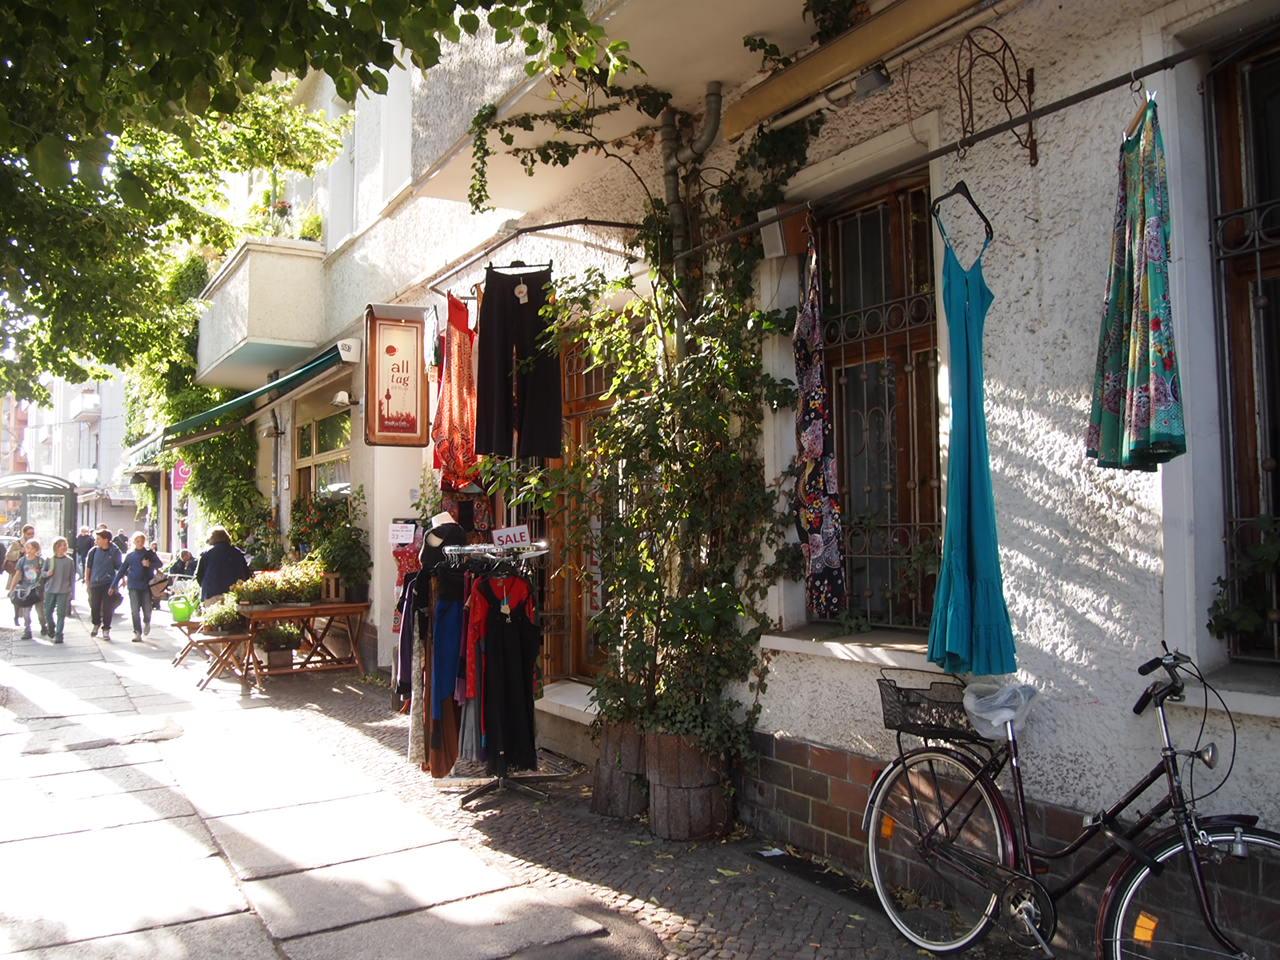 P6235681 アートと自然の多いベルリンの街並み